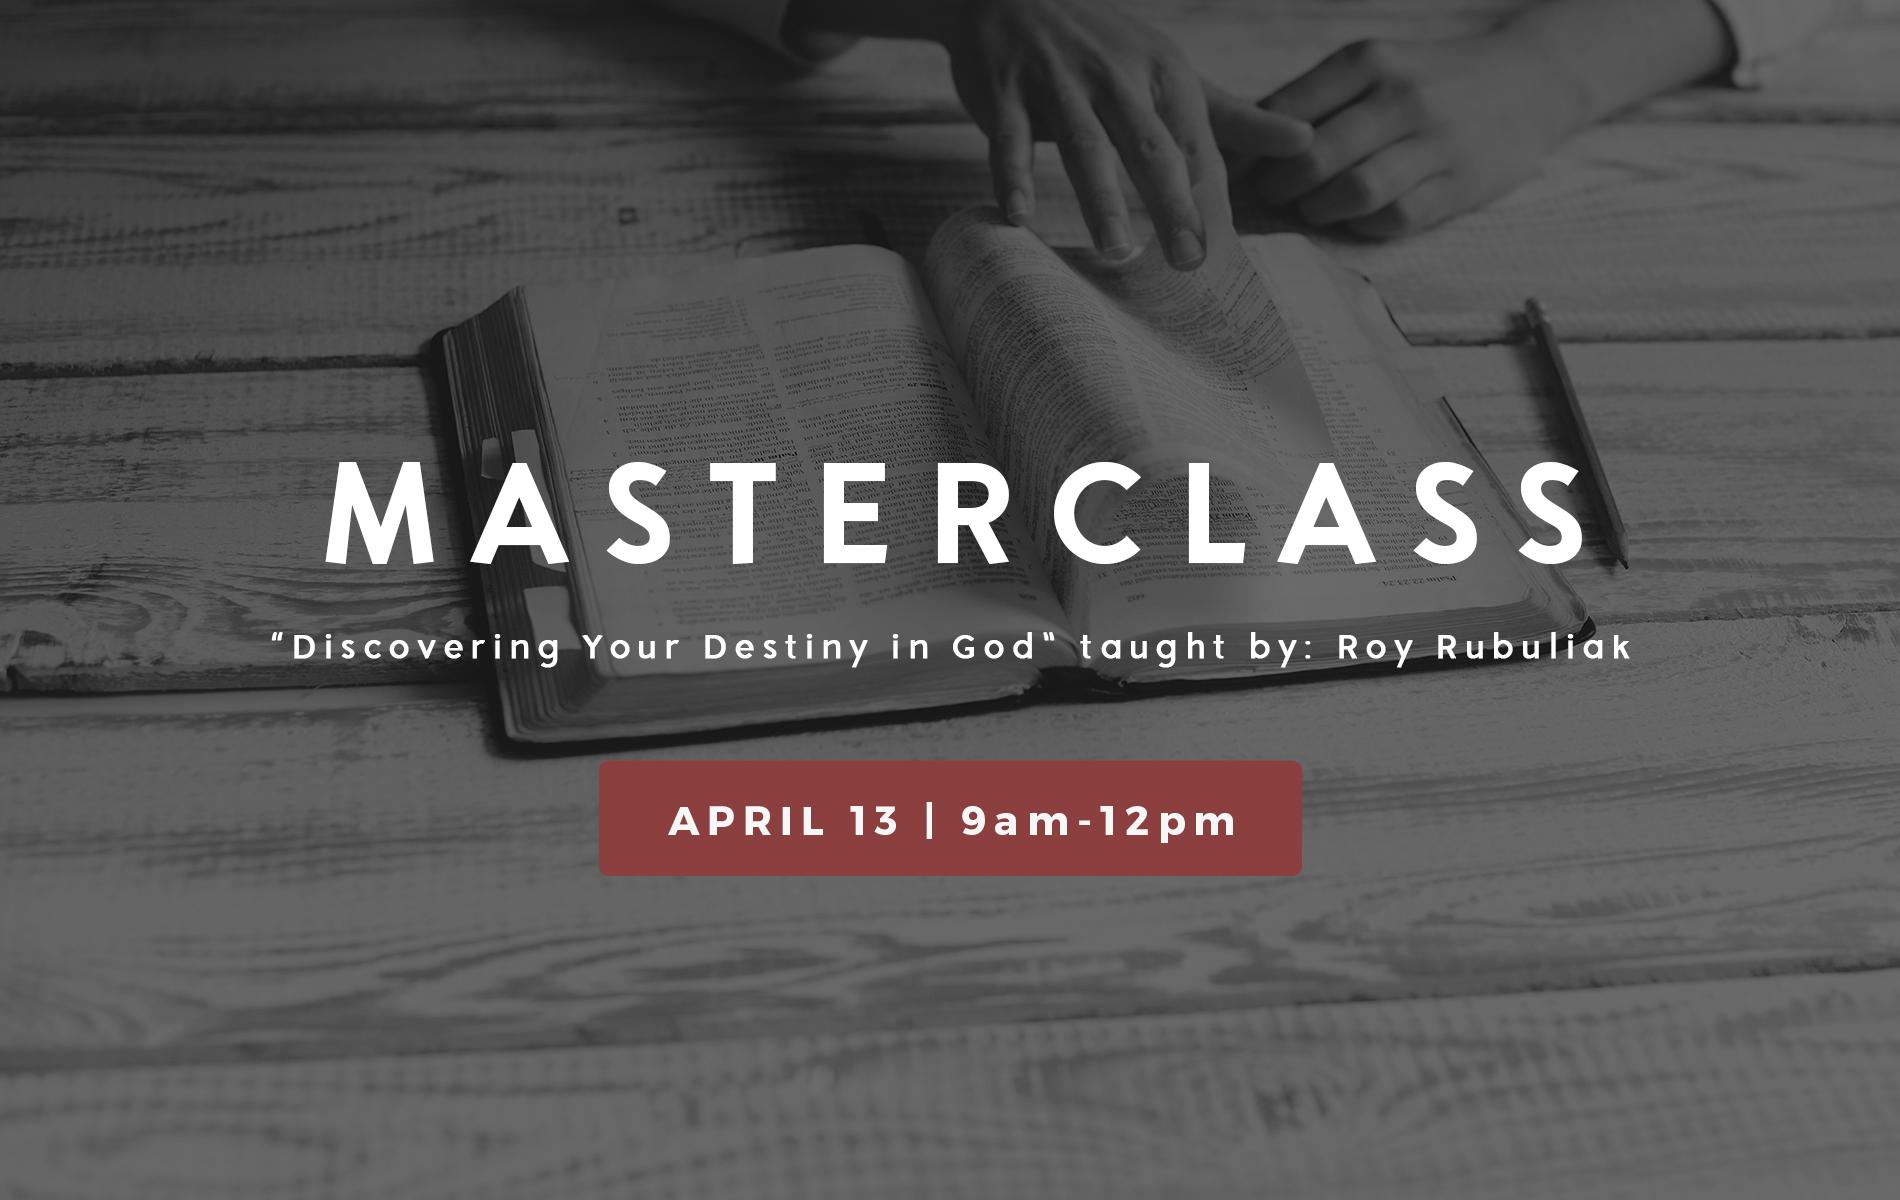 masterclass_april13_slide.jpg